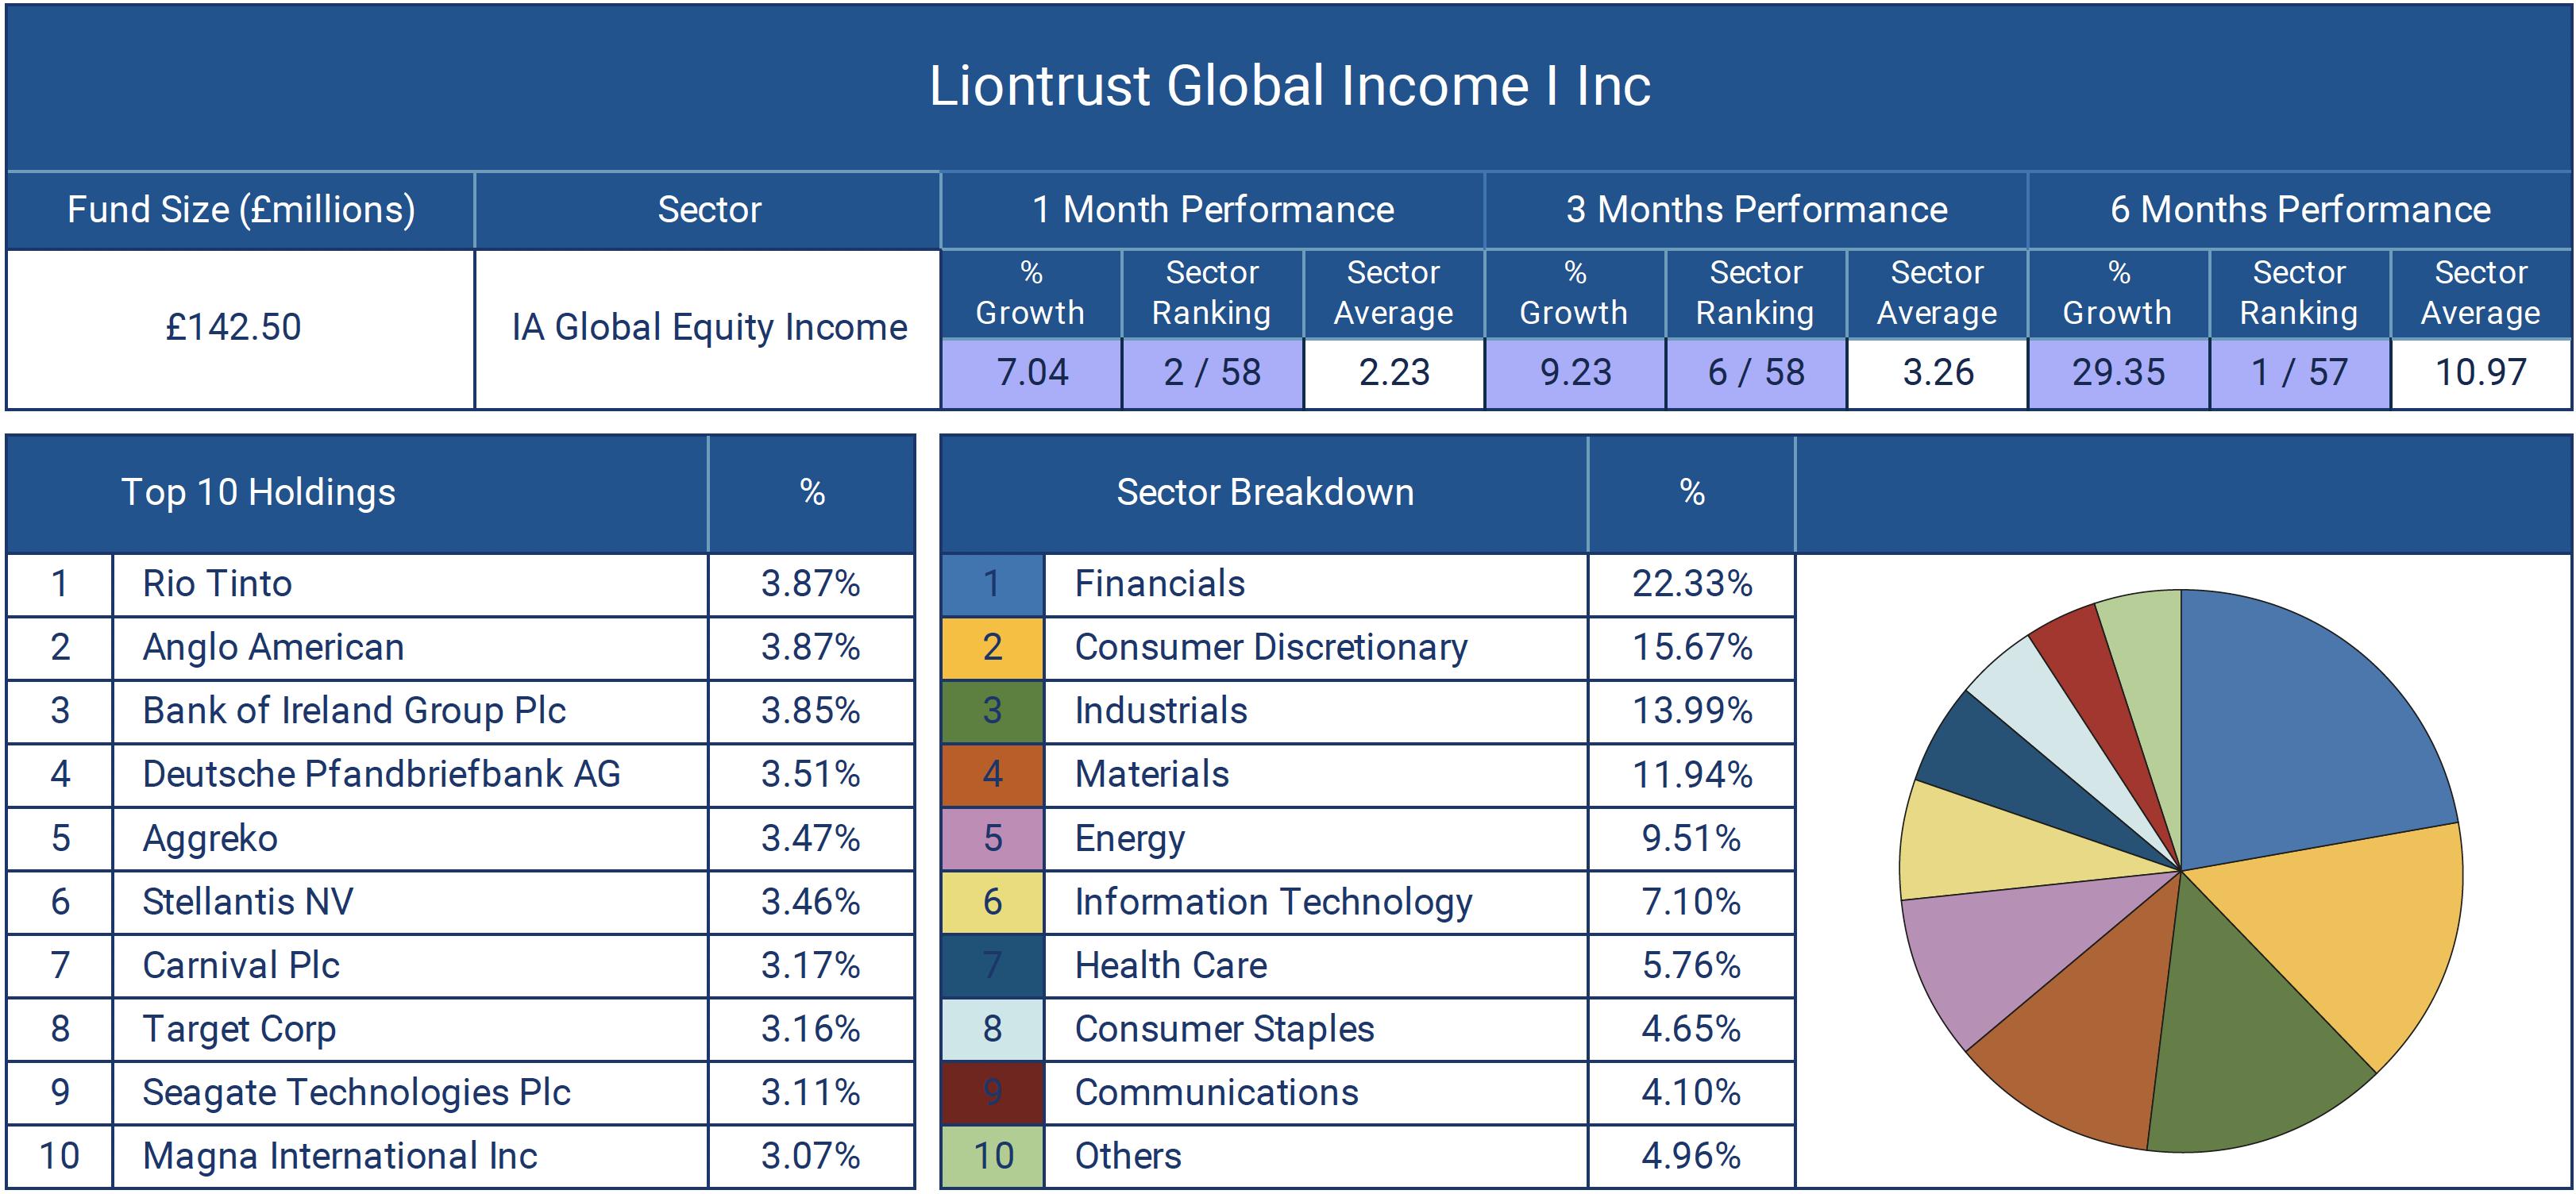 Liontrust Global Income